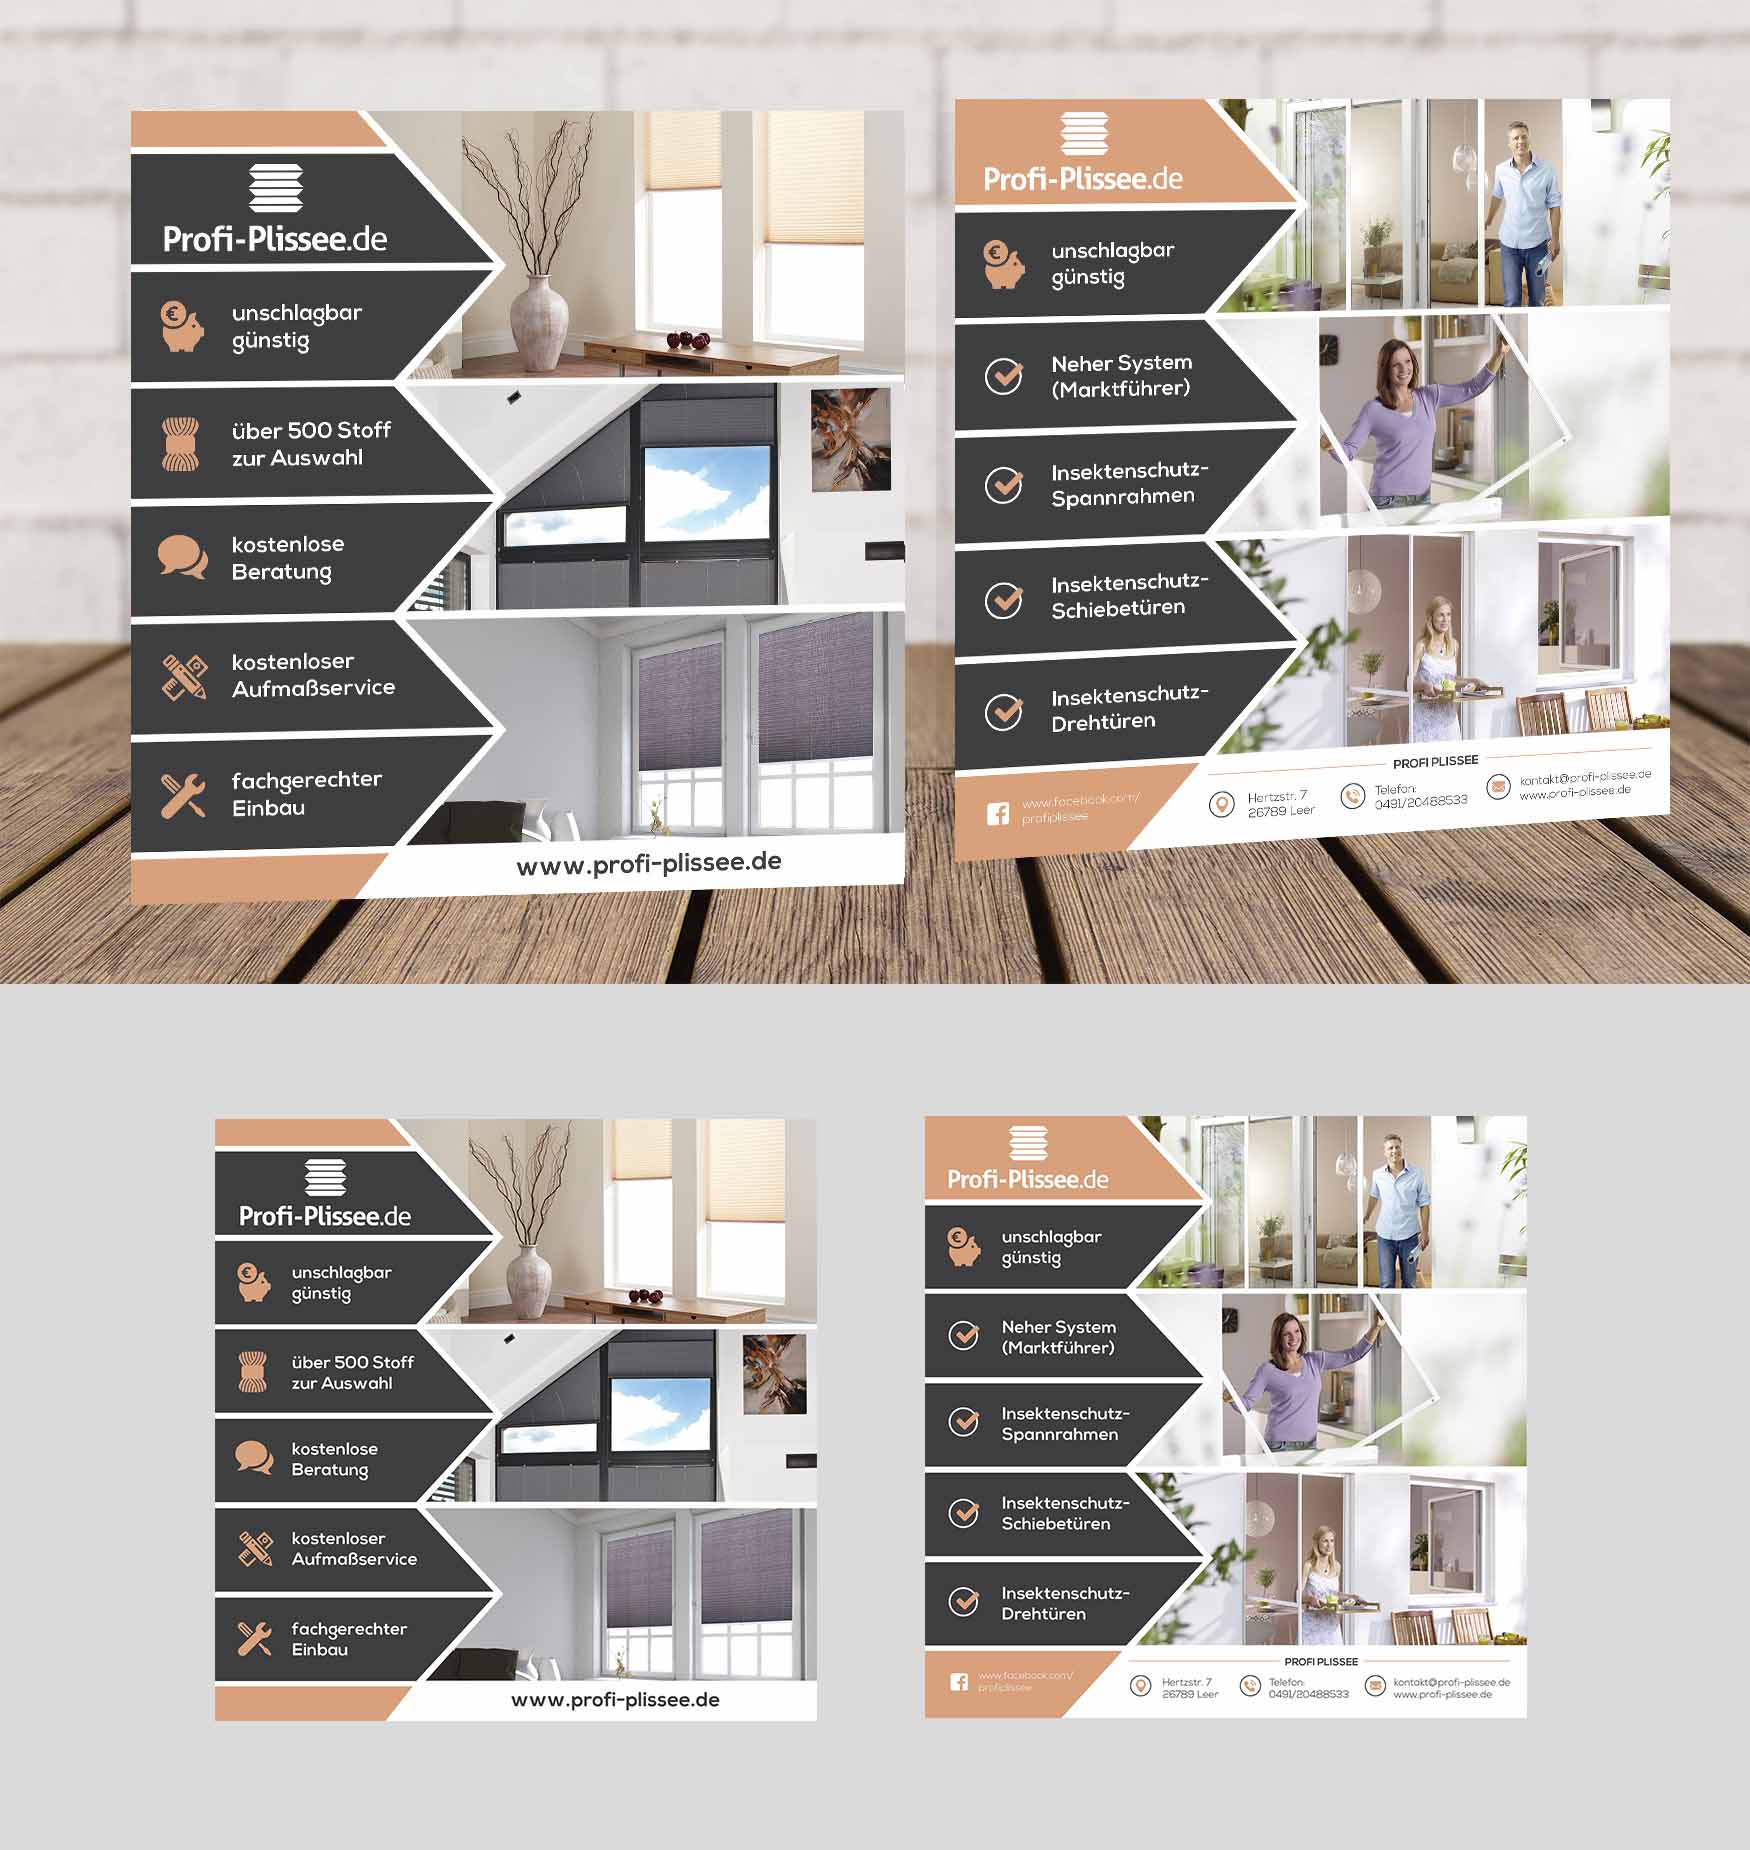 design #7 of MaDesigns